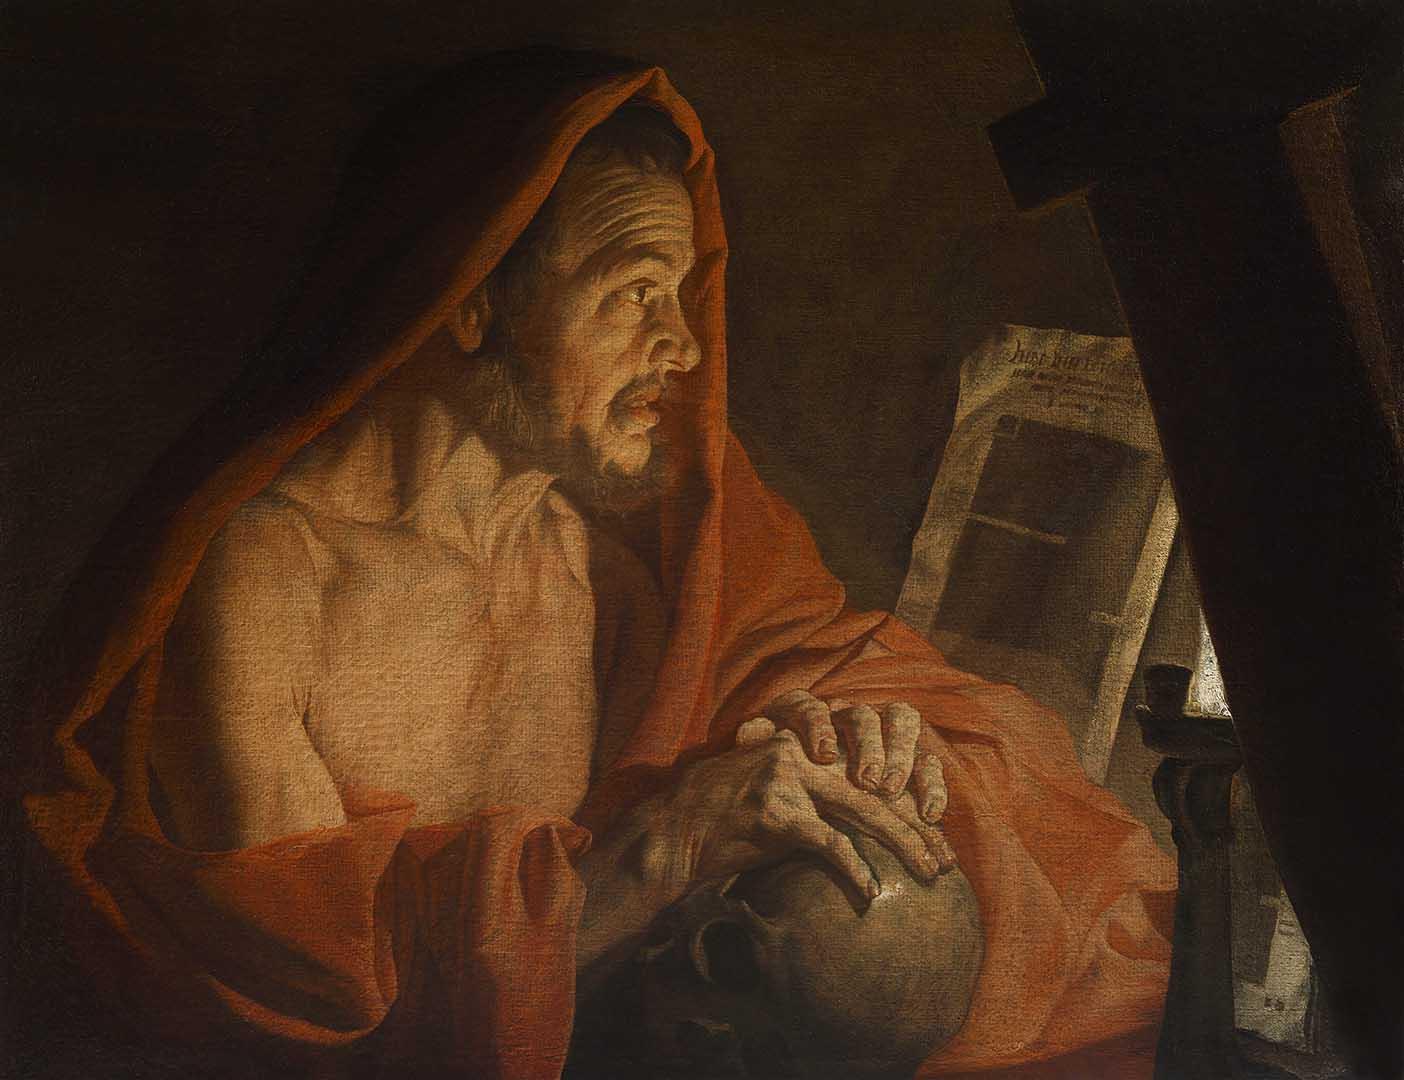 Catalogo San Jeronimo Matthias Stomer Galeria Caylus